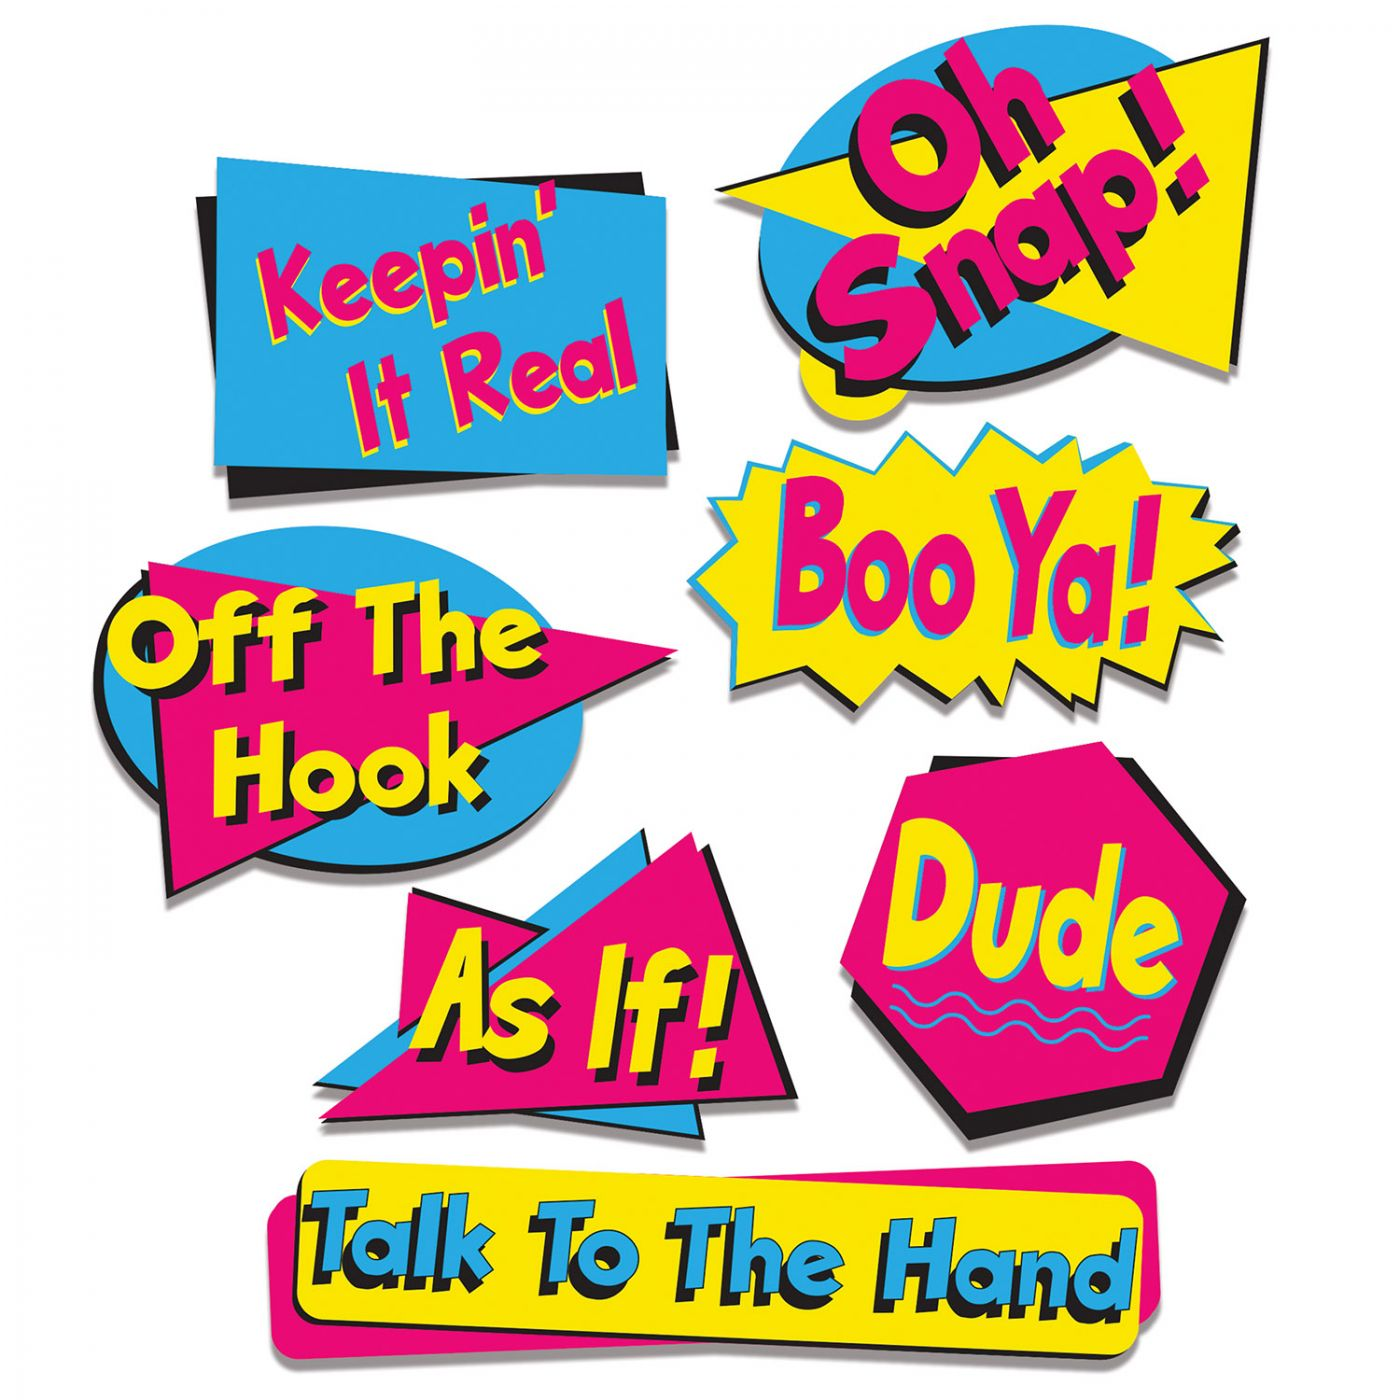 90's Phrase Cutouts image